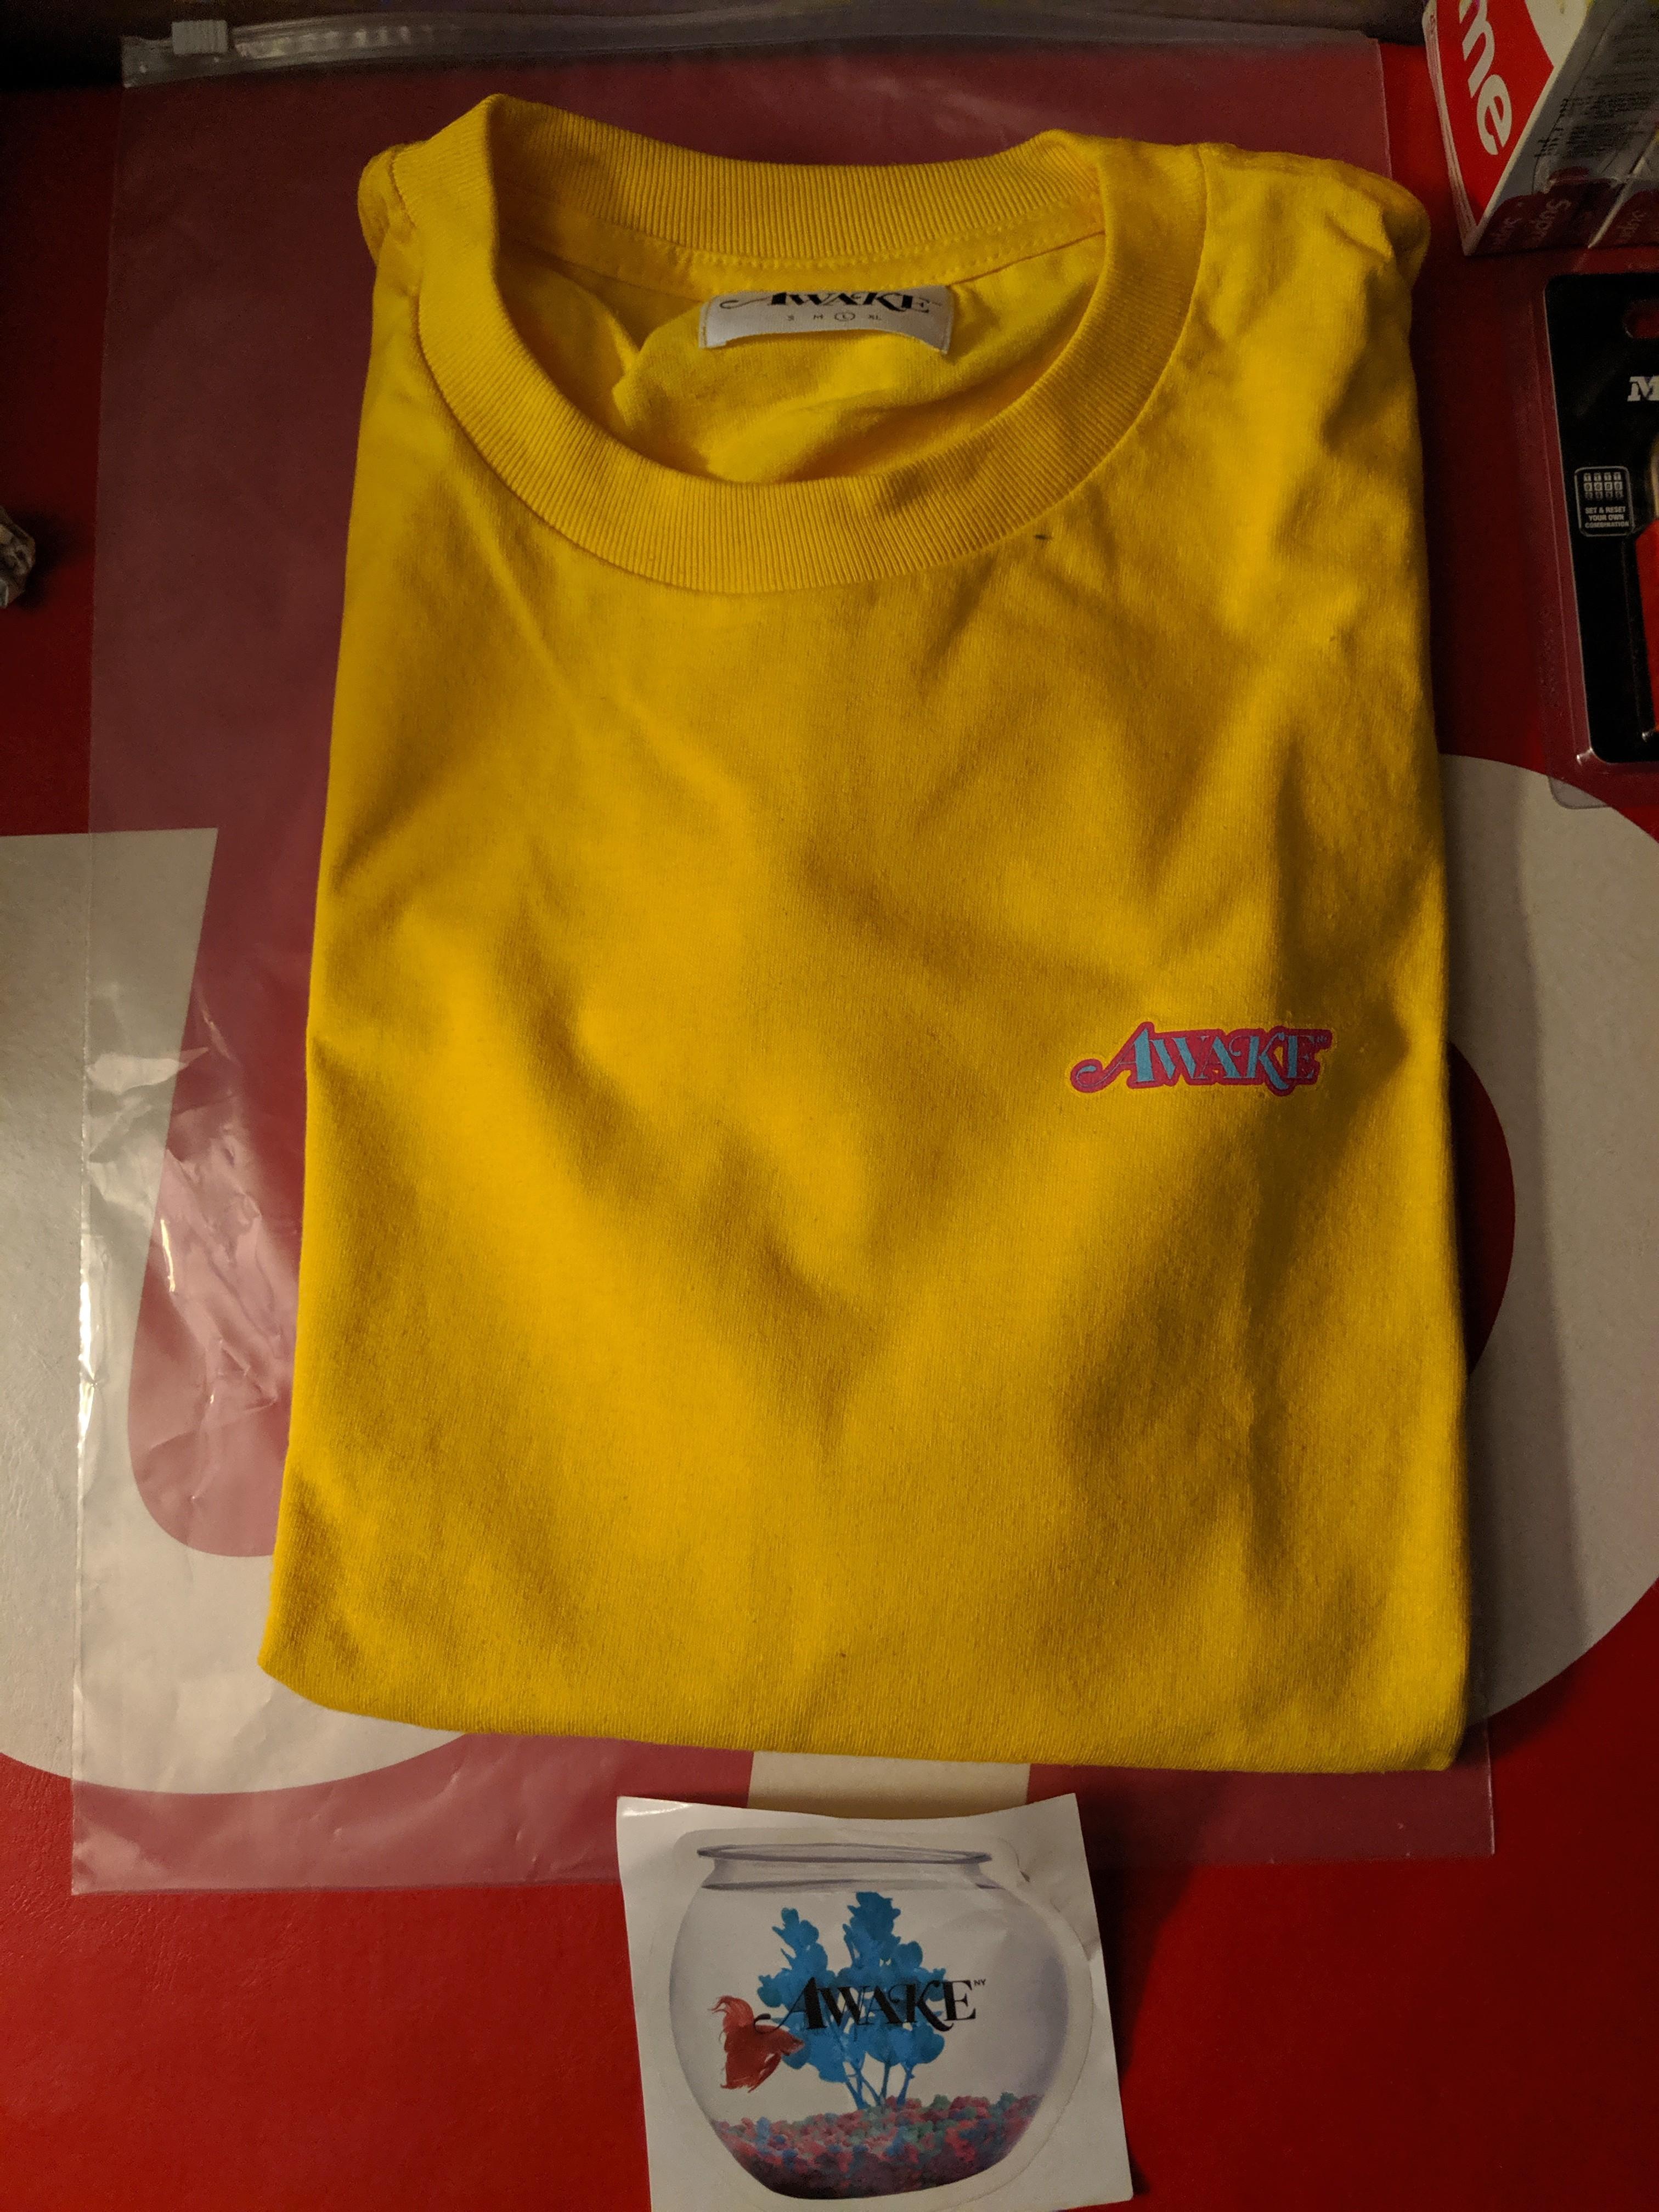 d7da119bac98a Awake NY Fall 2018 L/S T-shirt Yellow Large